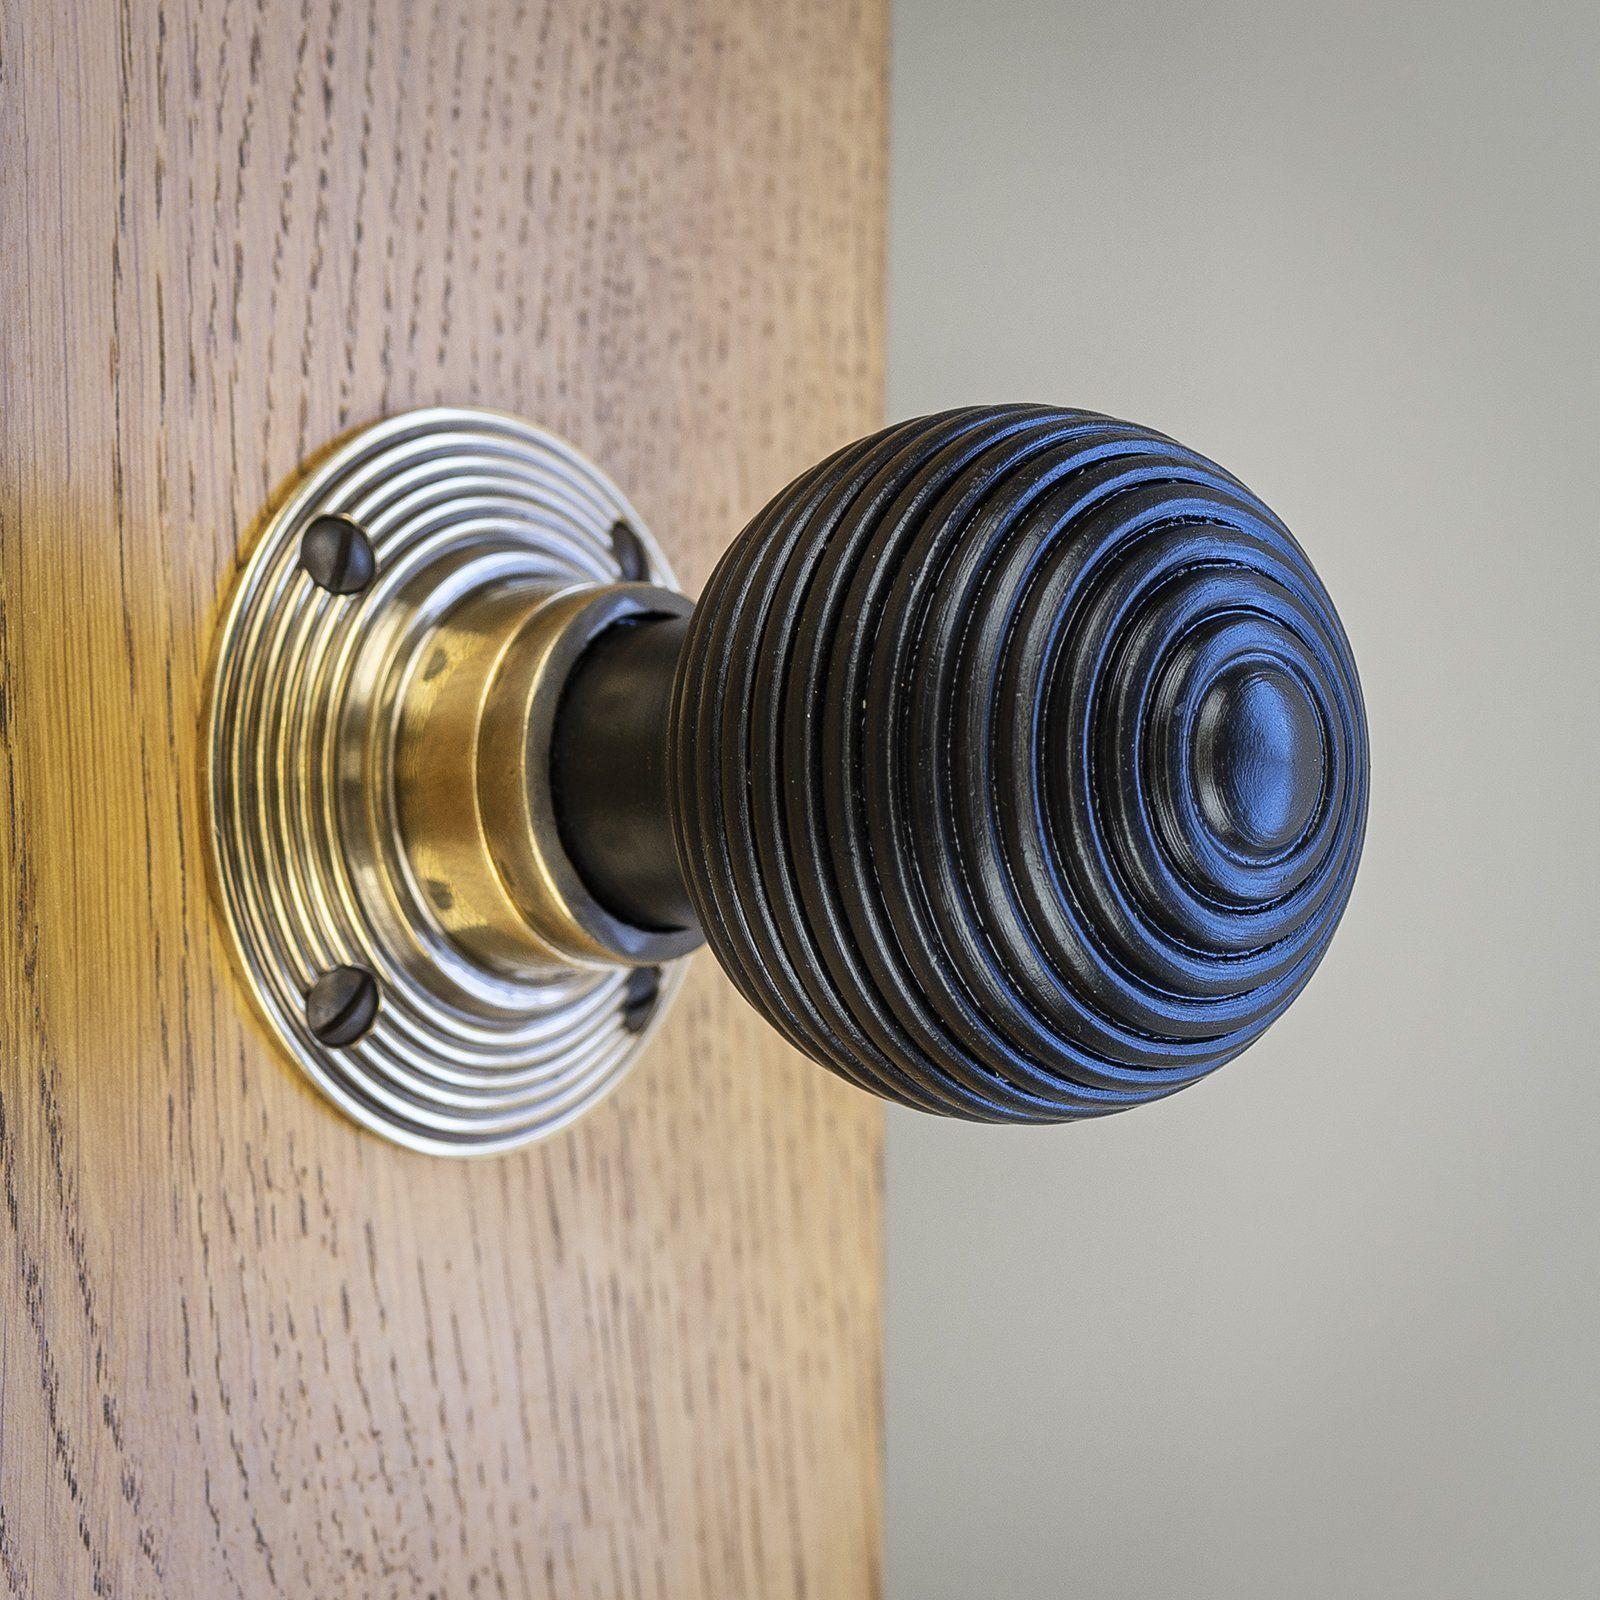 Ringed Natural Door Knobs Wooden Bun /& Ringed Rosewood /& Ebonised Pair New